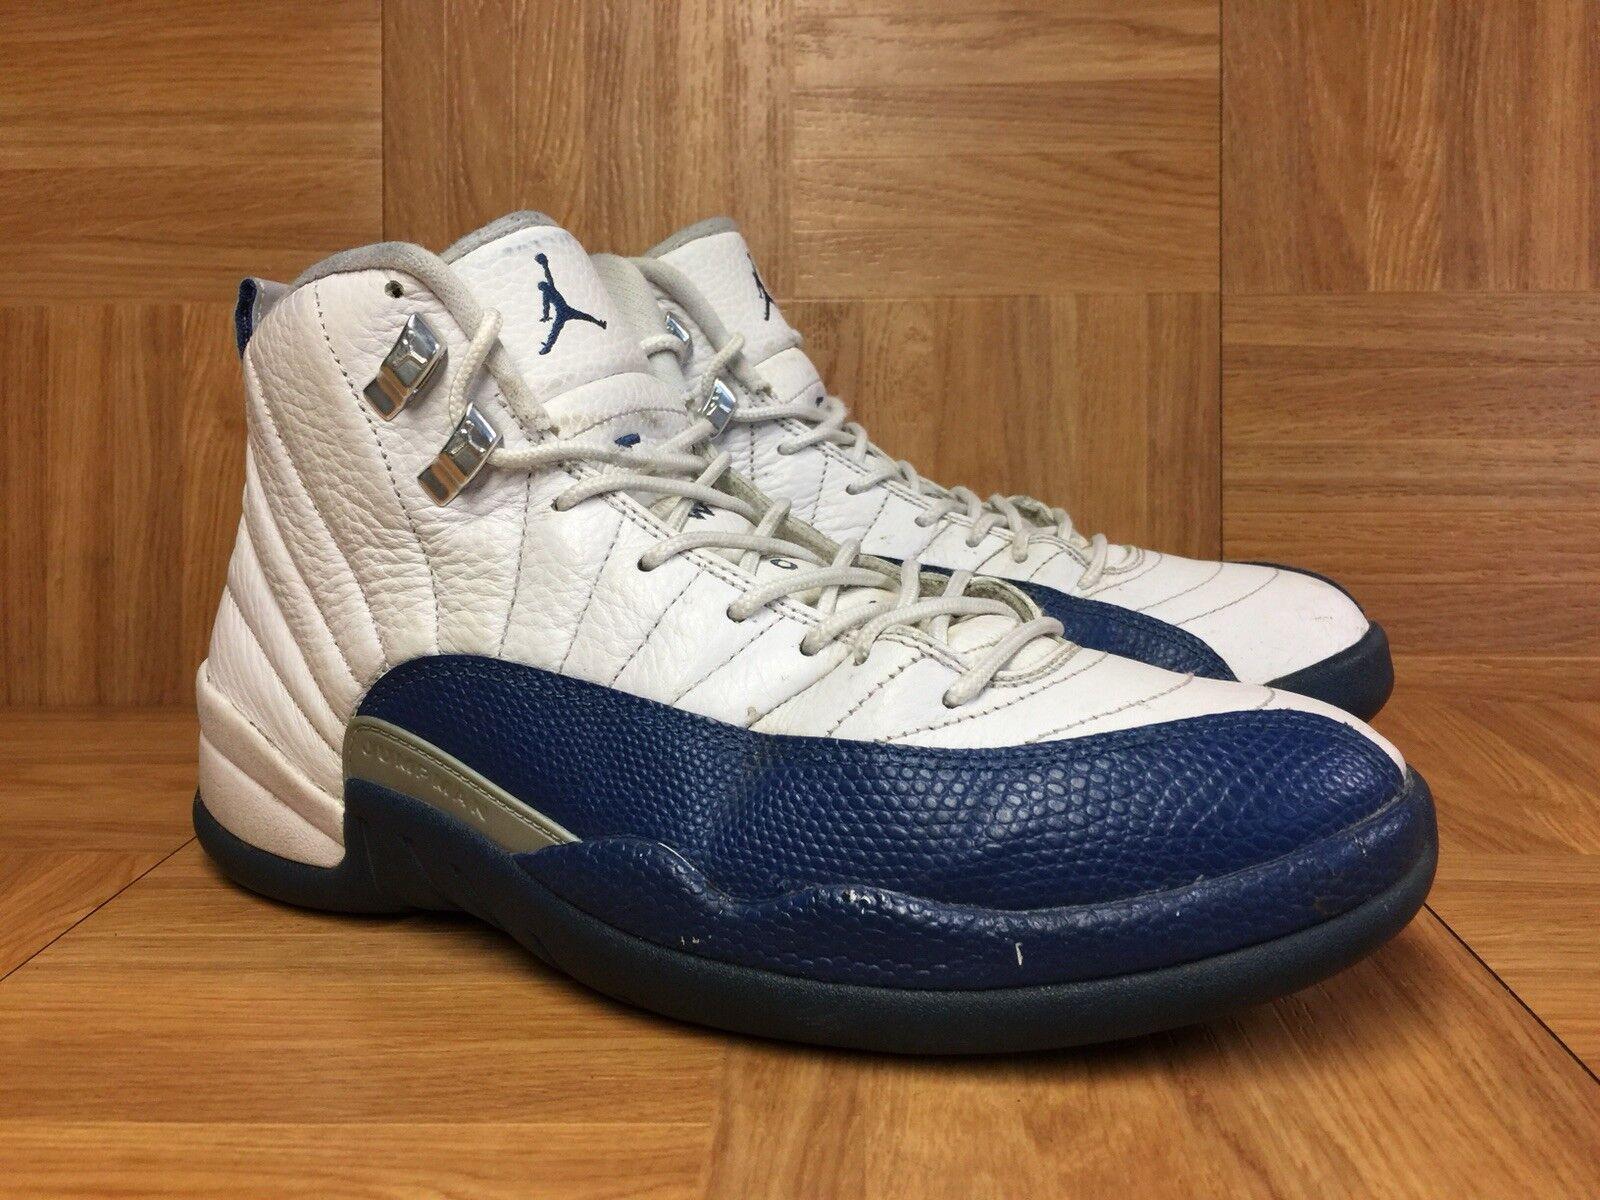 RARE Nike Air Jordan 12 XII Retro French bluee White Silver Sz 9 130690-113 Men